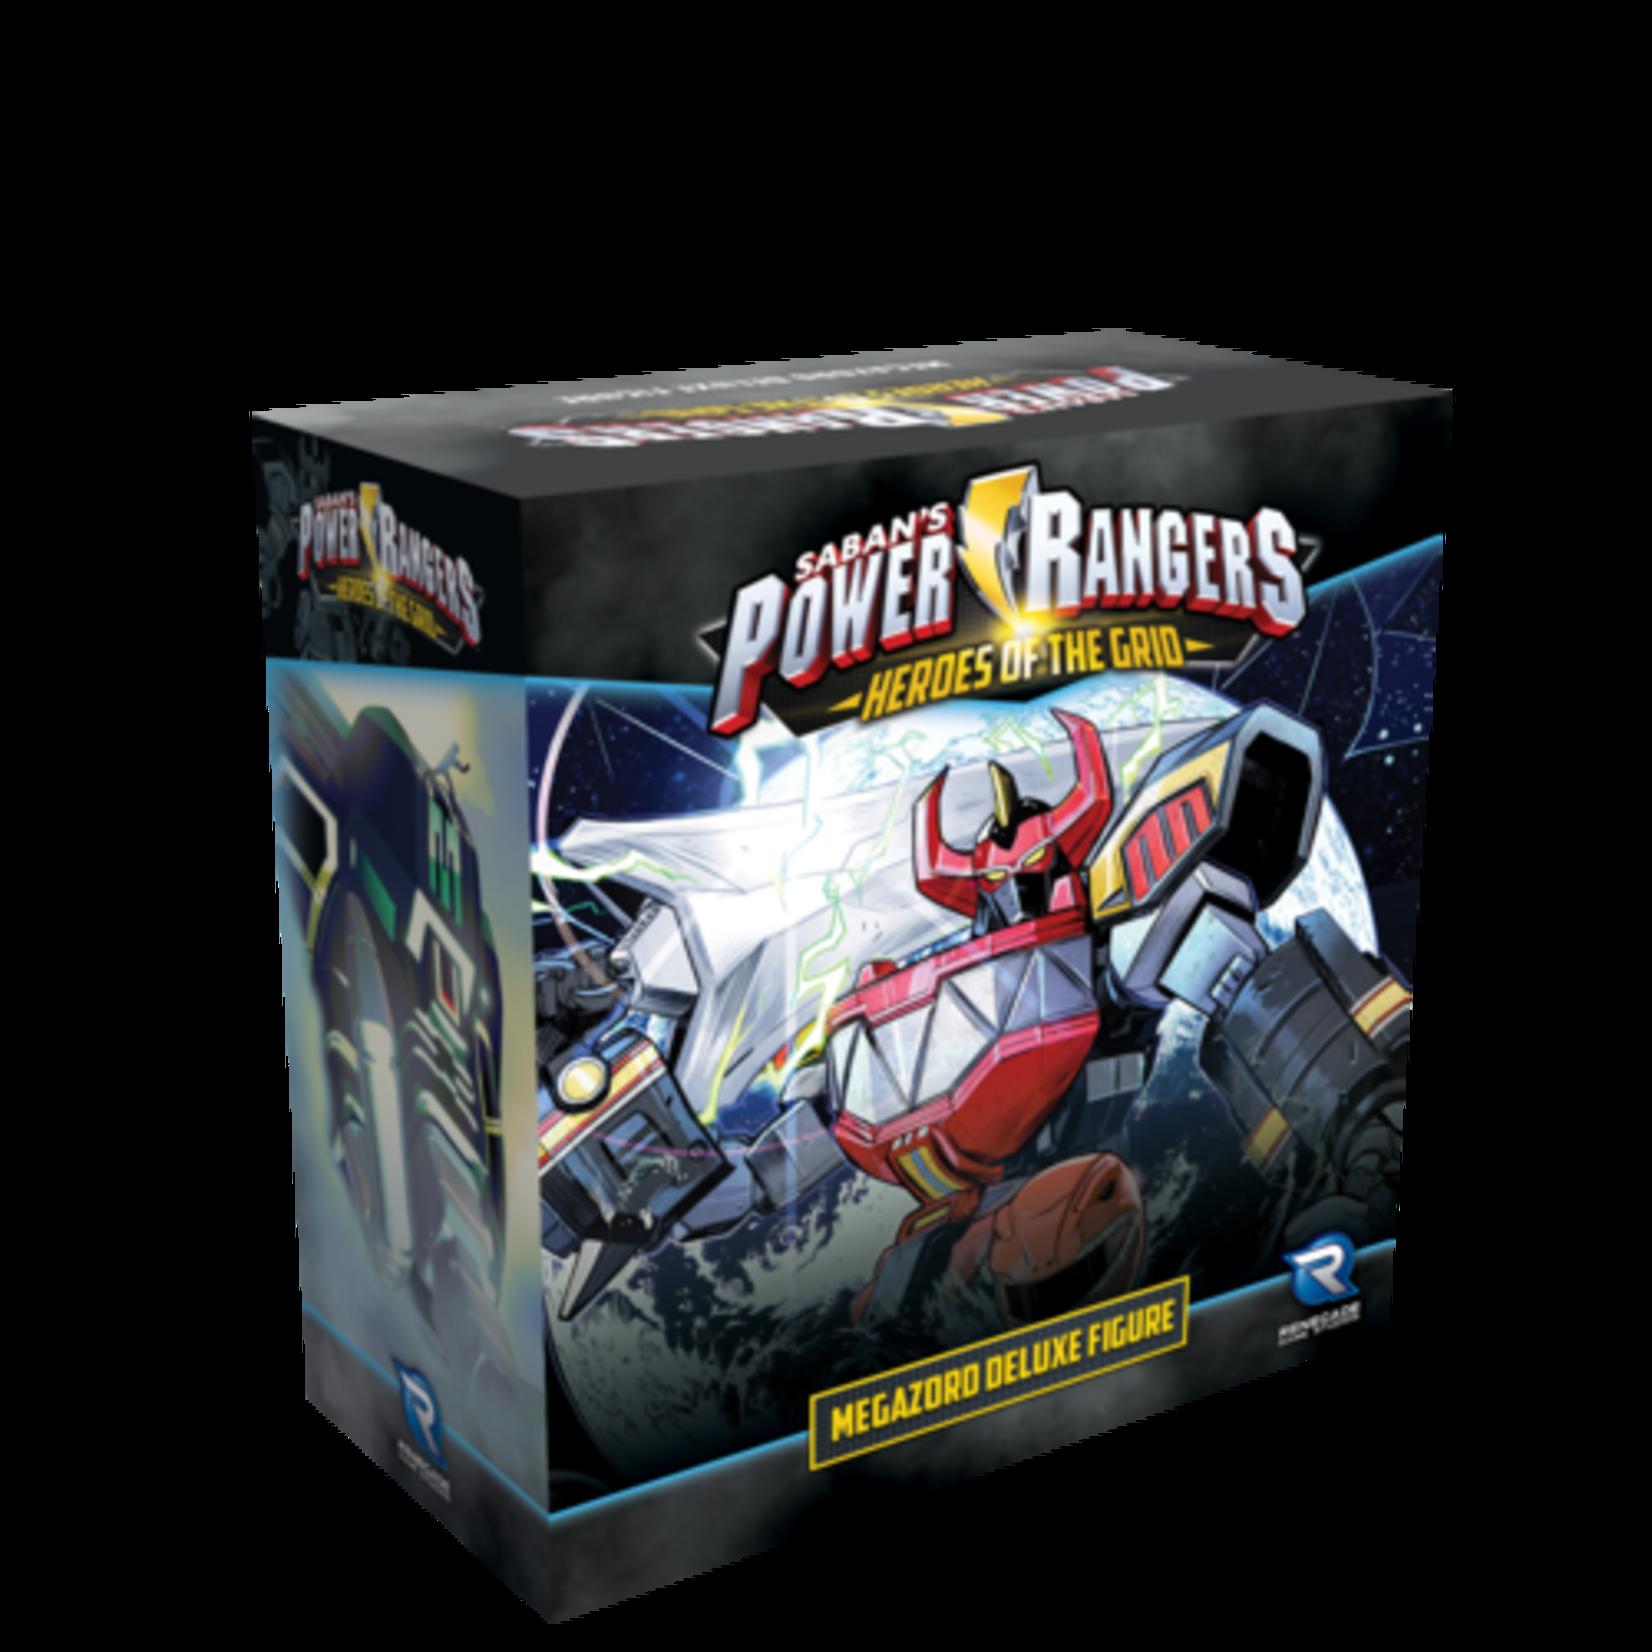 Renegade Power Rangers: Heroes of the Grid - Megazord Figure